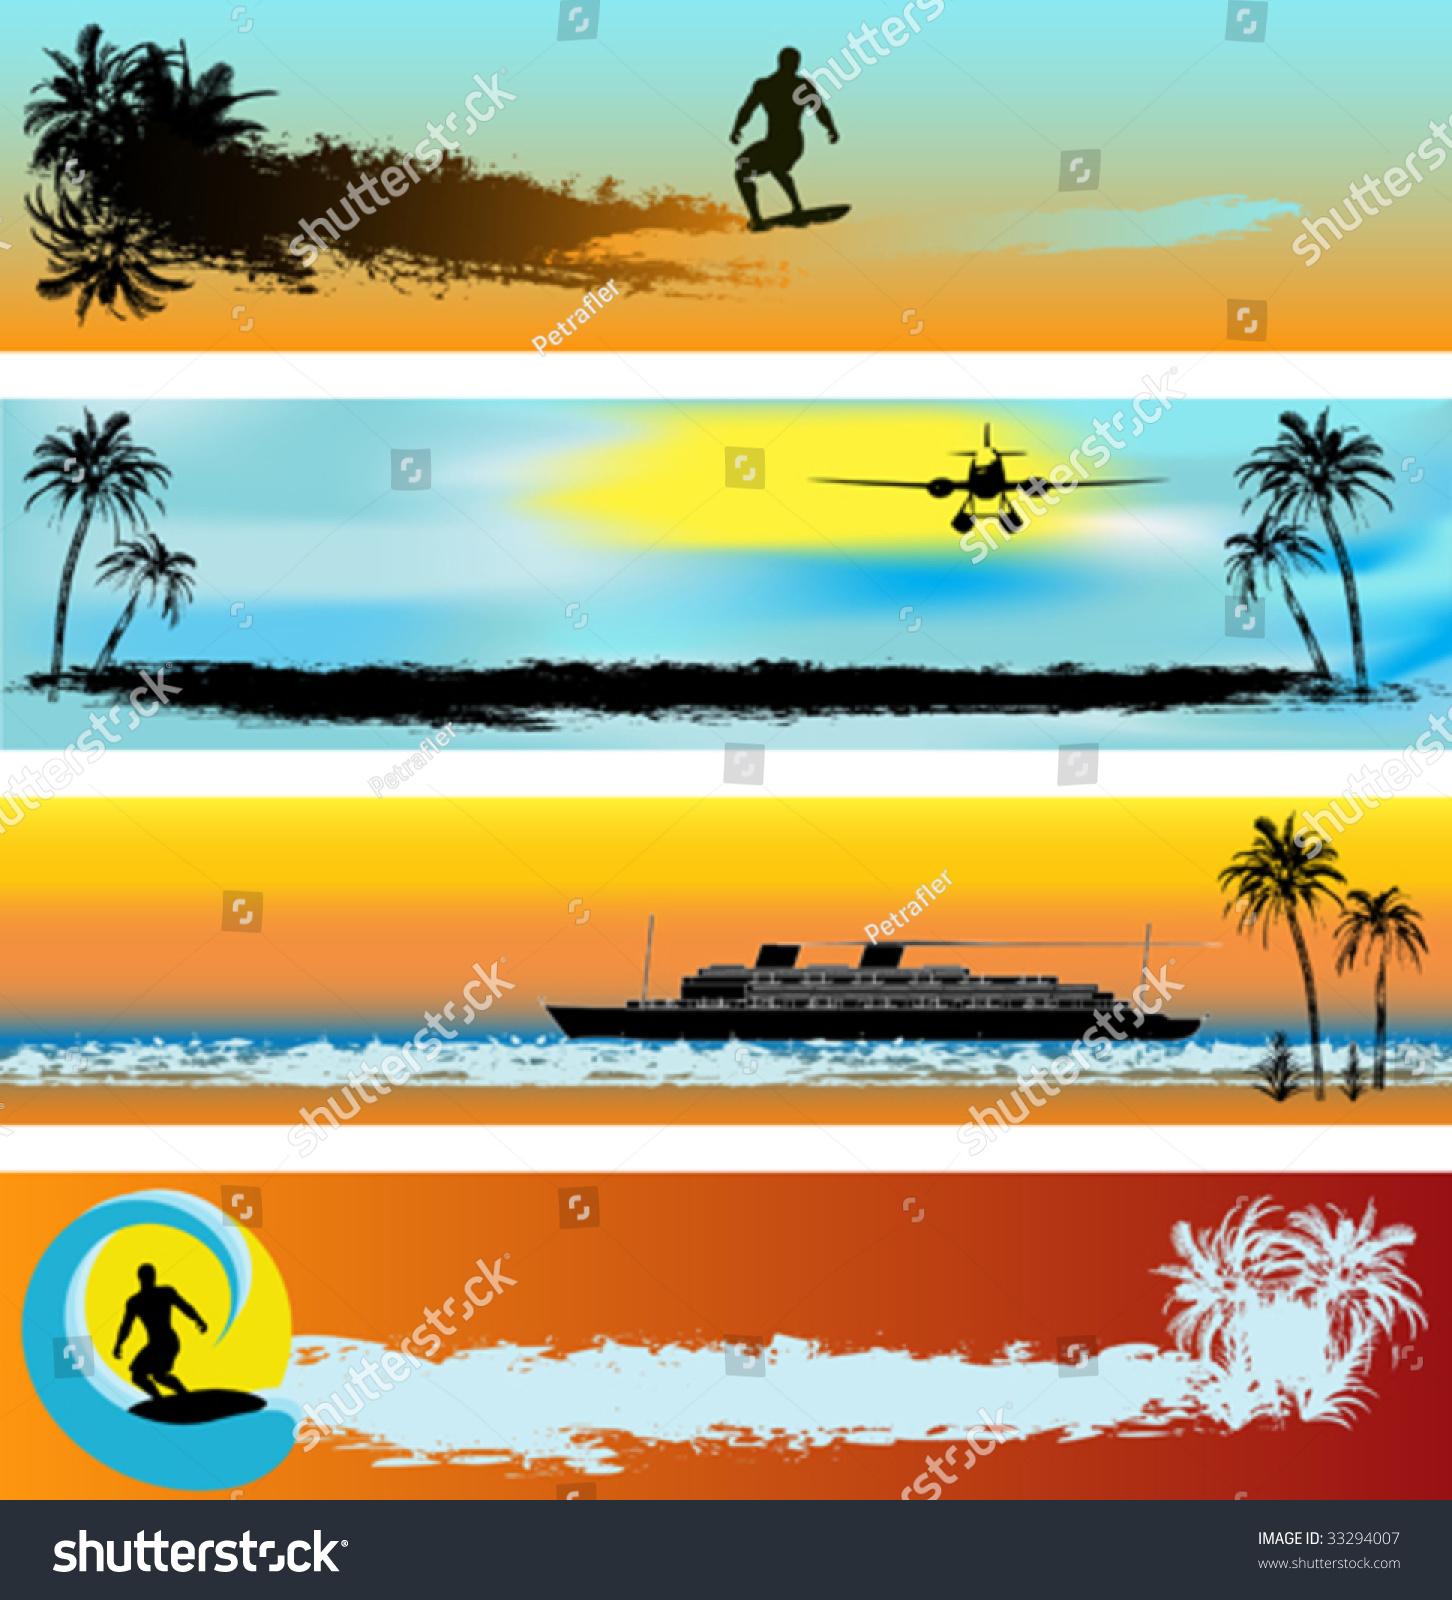 Web Banner Templates. tropical beach web banner templates royalty ...